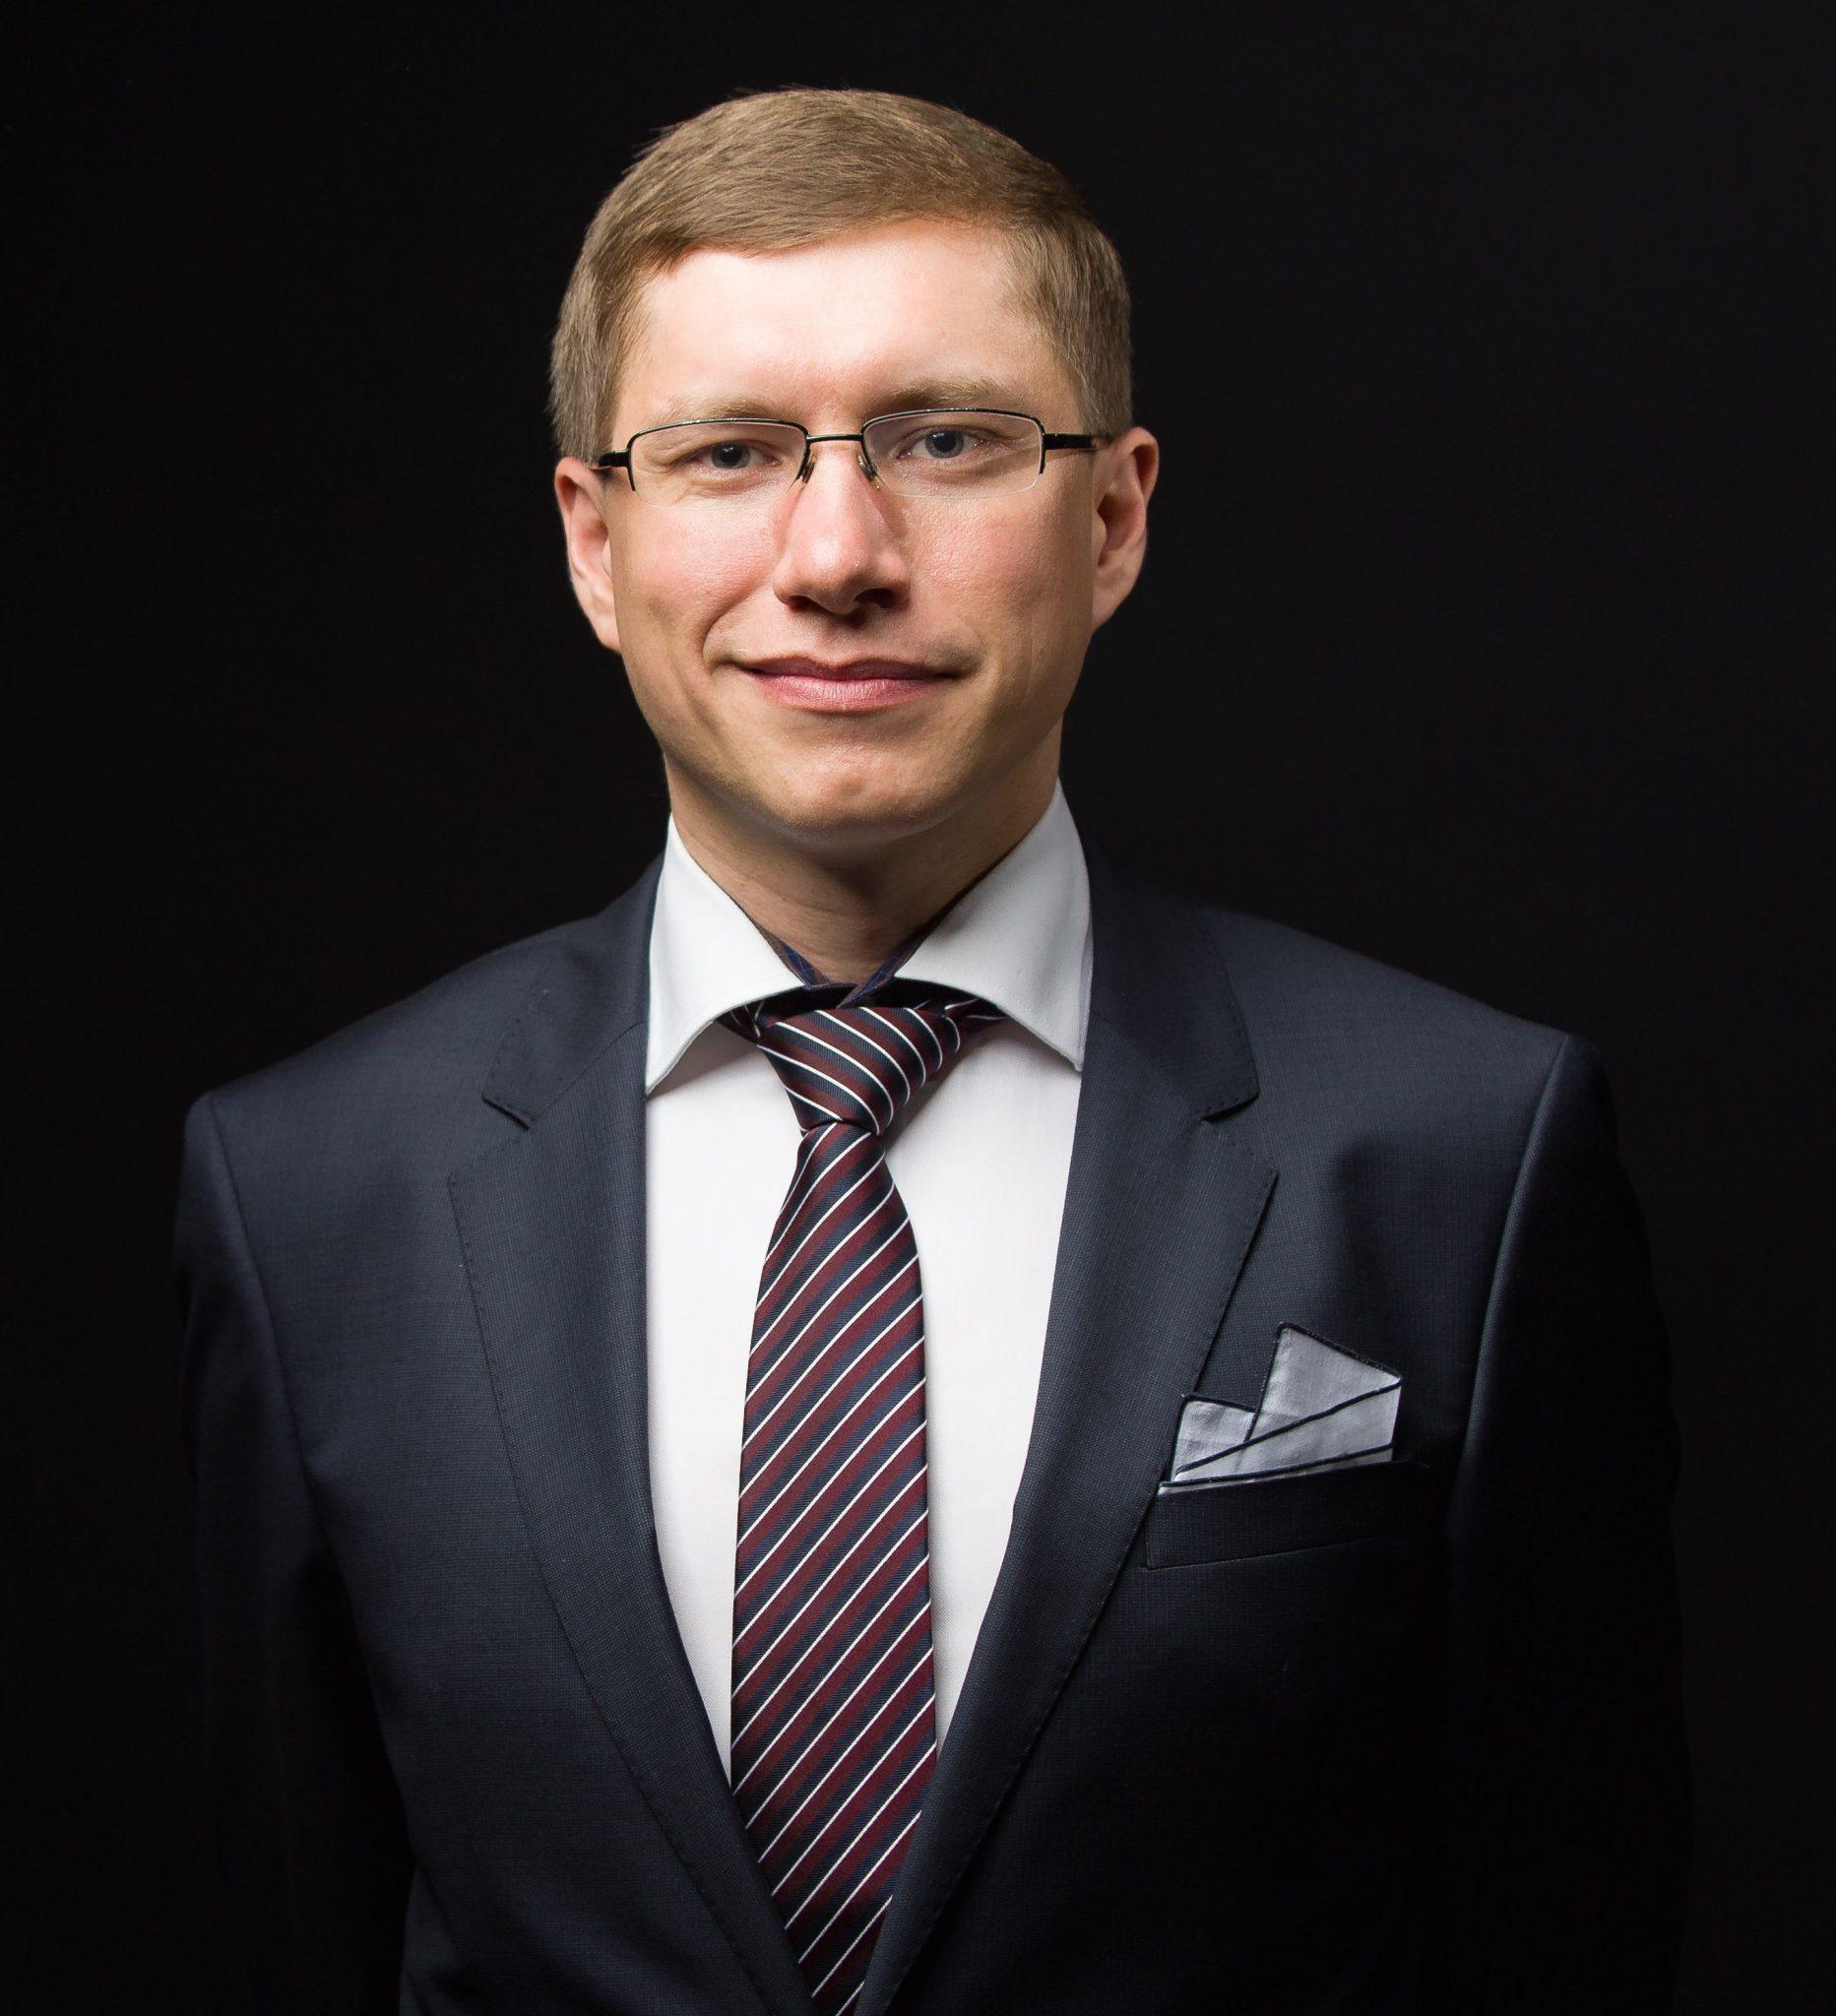 Konrad Grudziński